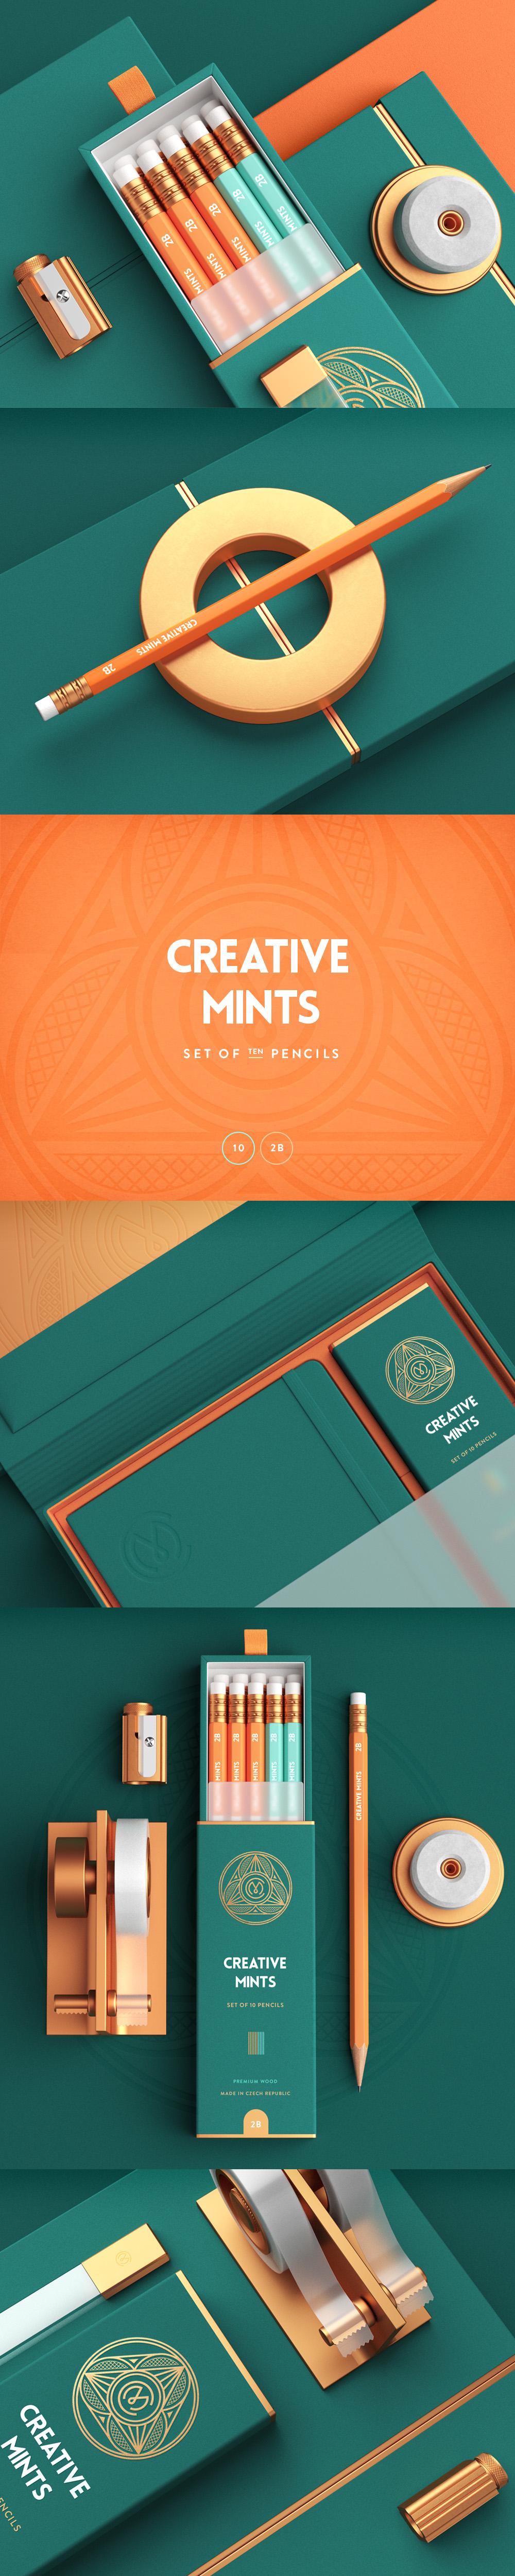 Design craft logo packaging pencil box